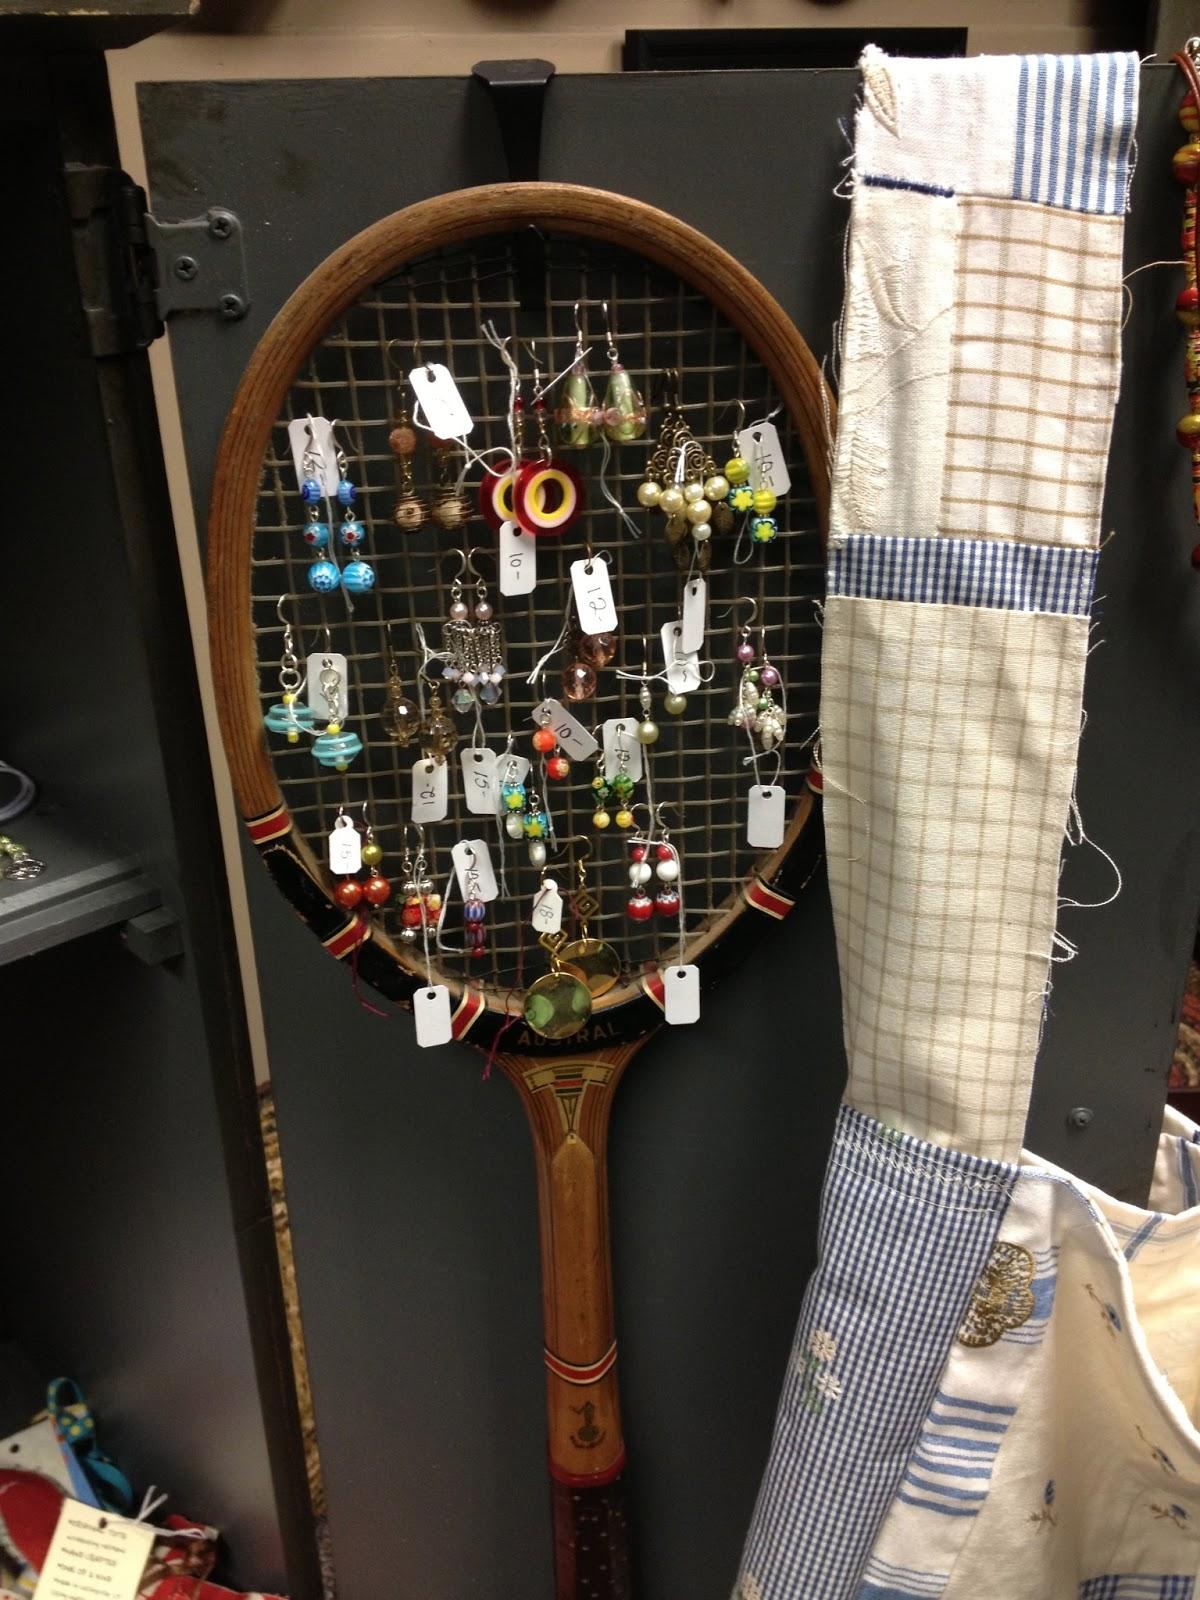 Displaying Vintage Earrings On An Antique Tennis Racket